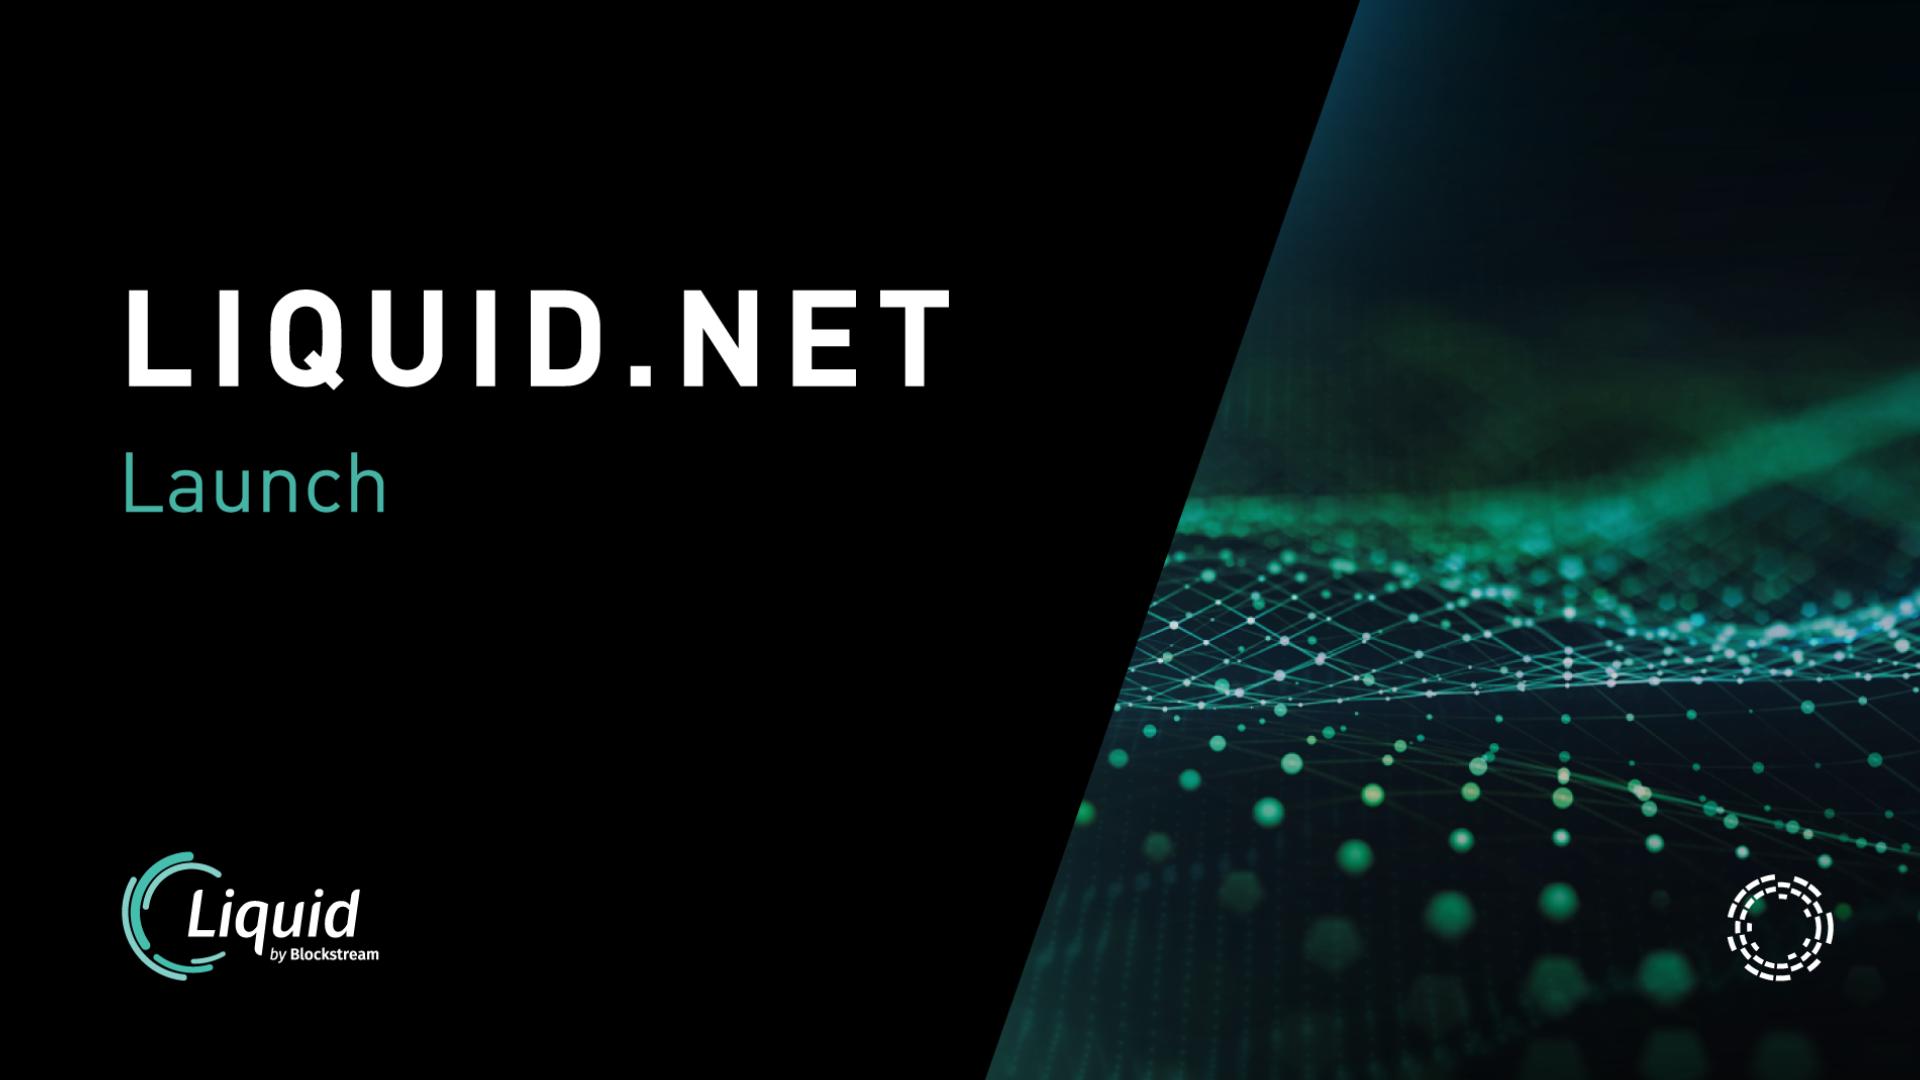 Liquid.net: Basecamp for the Liquid Network